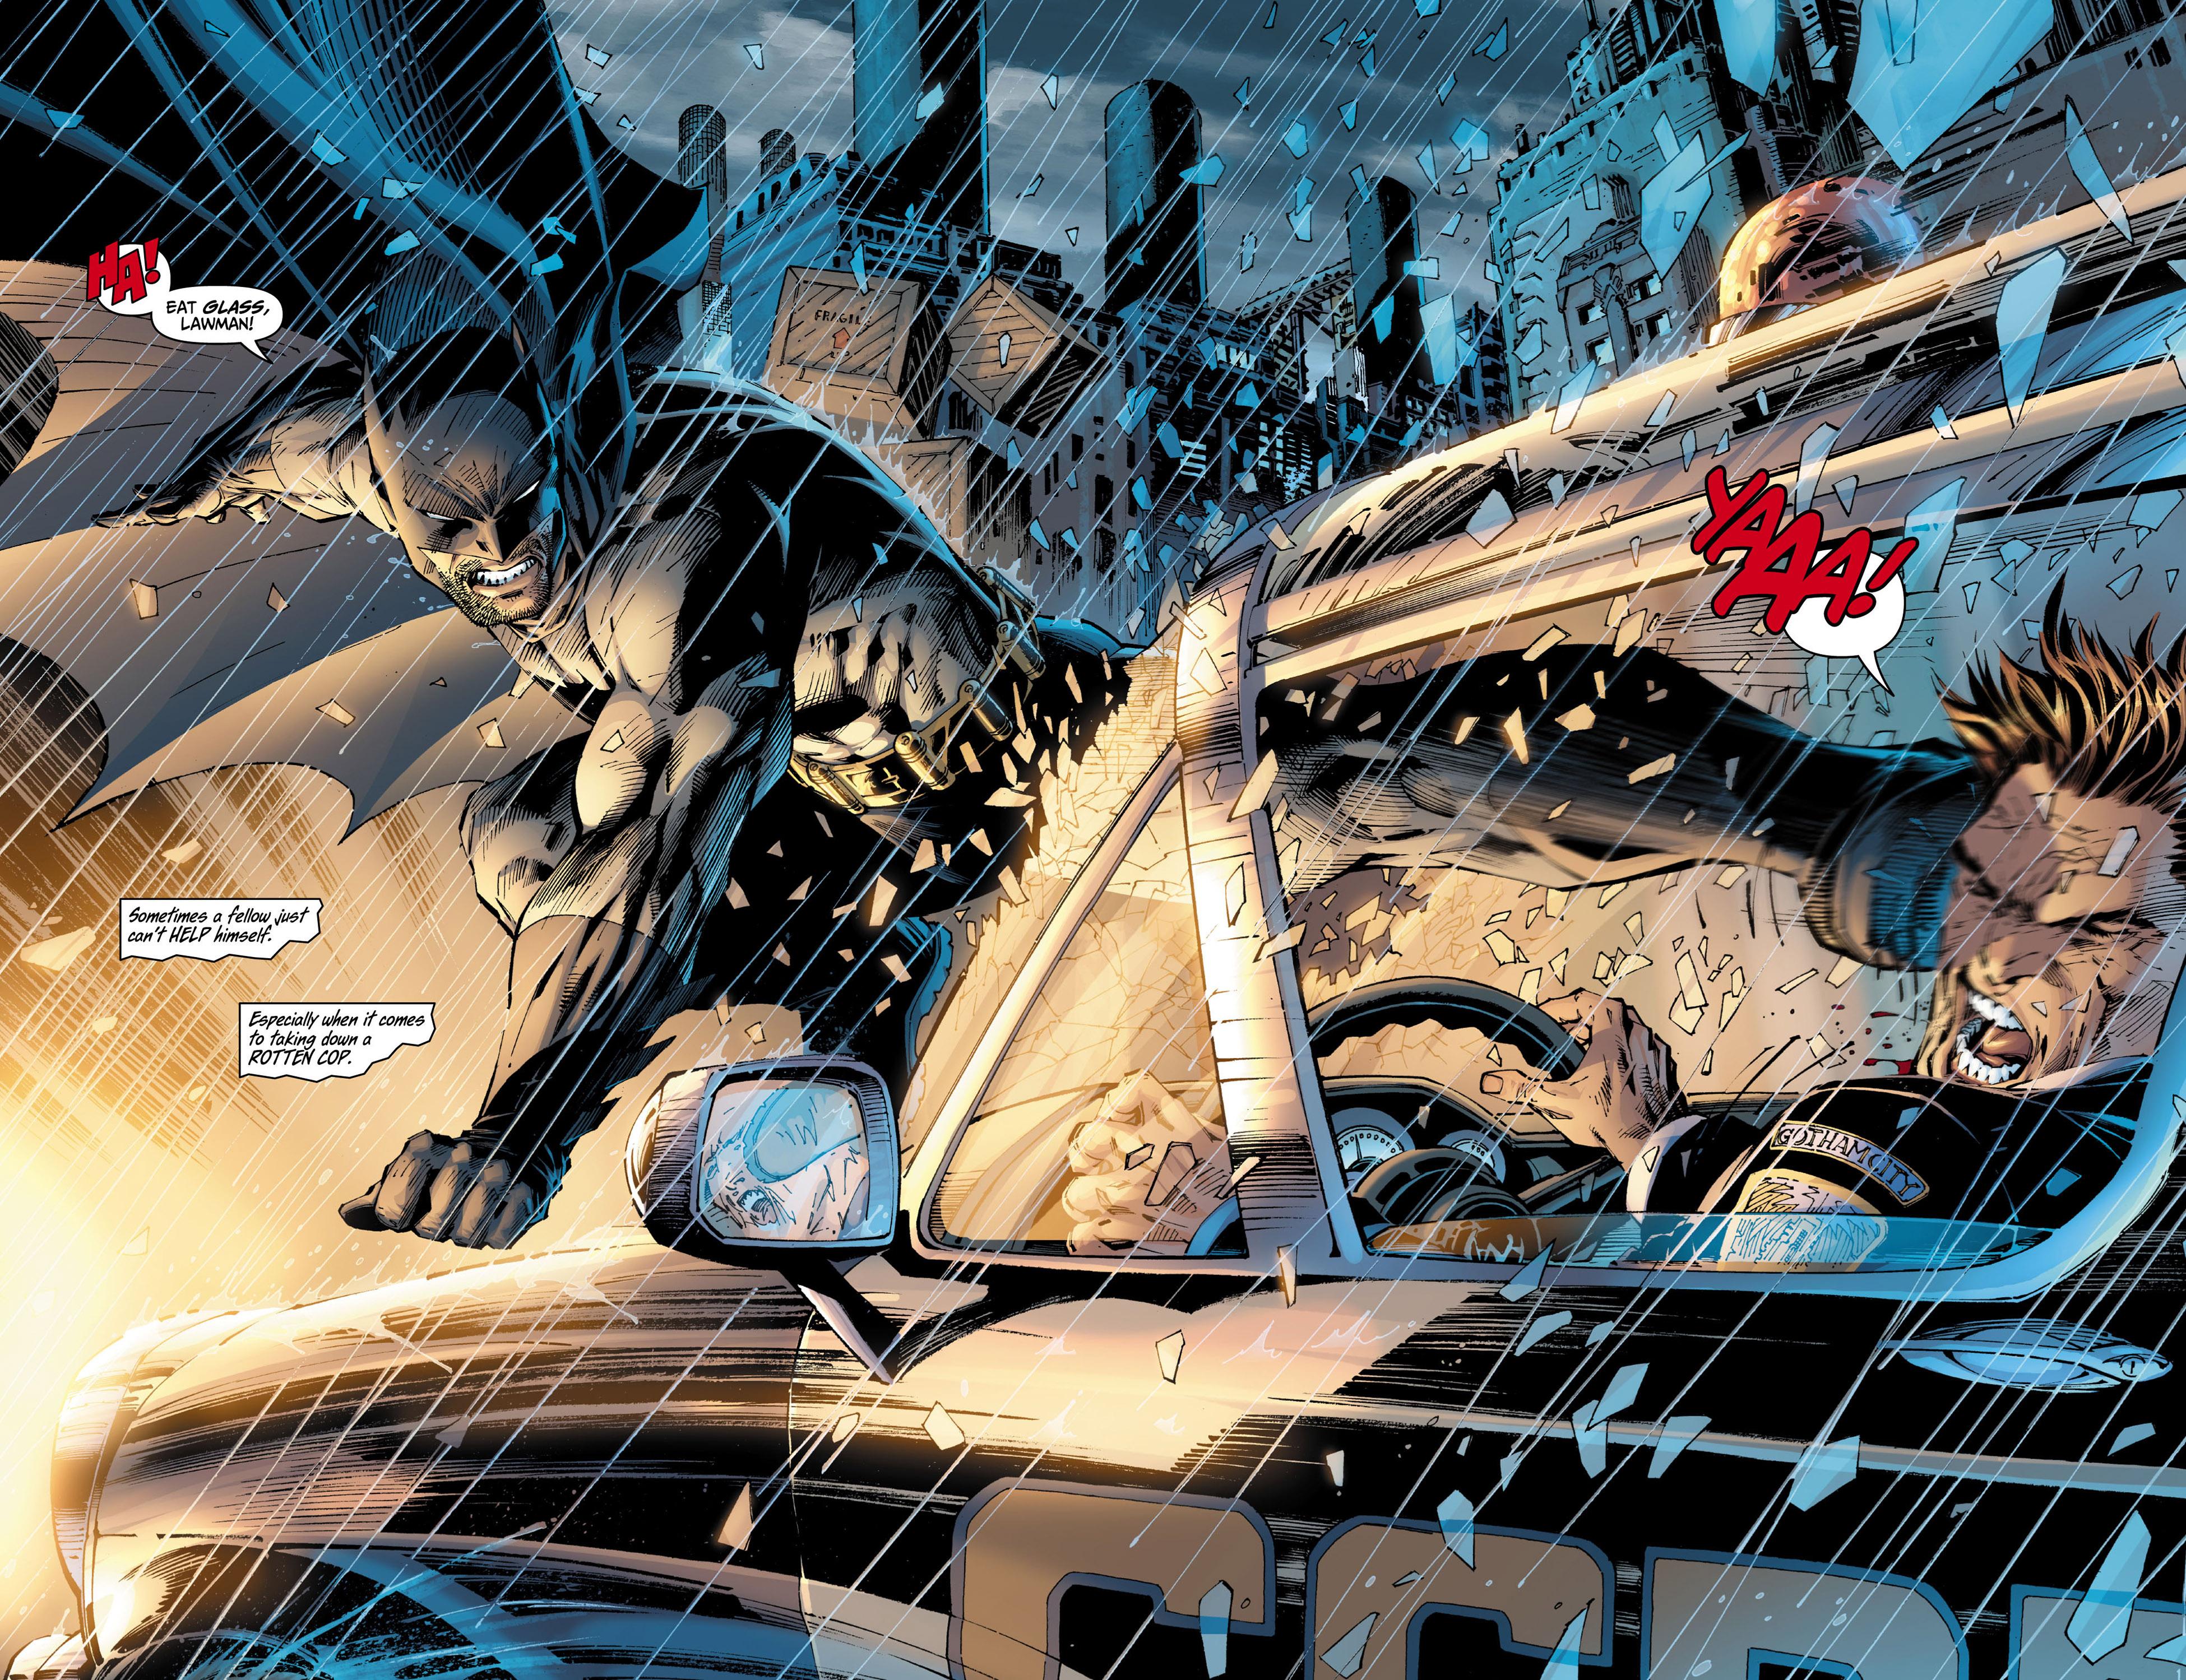 Read online All Star Batman & Robin, The Boy Wonder comic -  Issue #6 - 18